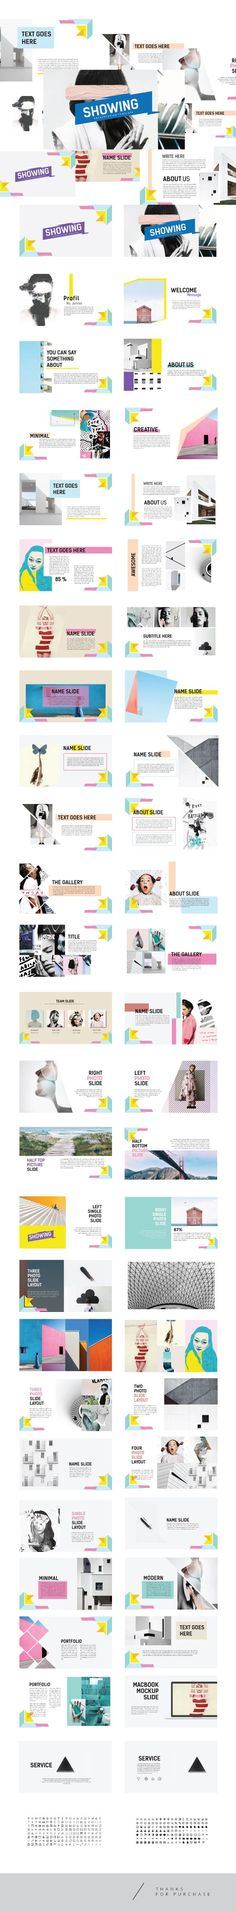 ShowUp - Multipurpose Creative Template Keynote - Miscellaneous Keynote Templates